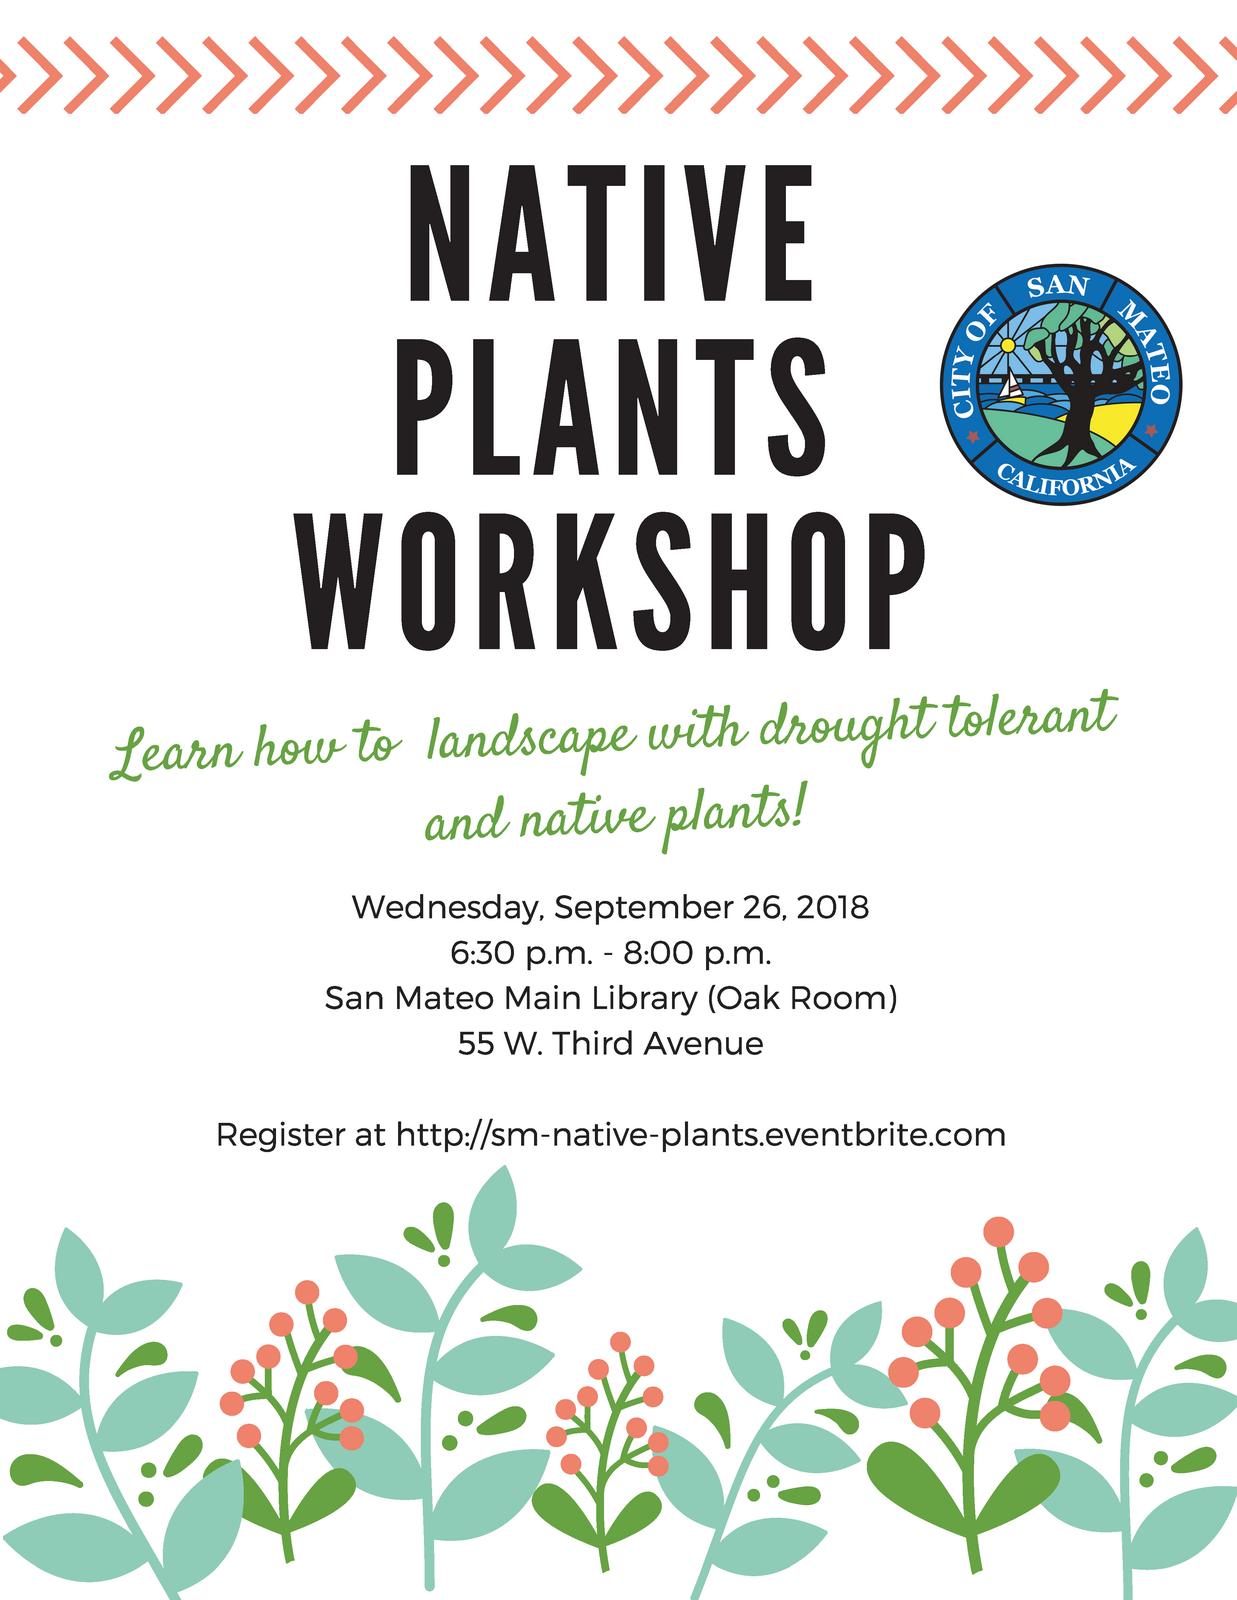 dda301770dbe5 Native Plants and Drought Tolerant Landscape Workshop – September 26th  (City of San Mateo) | Nextdoor